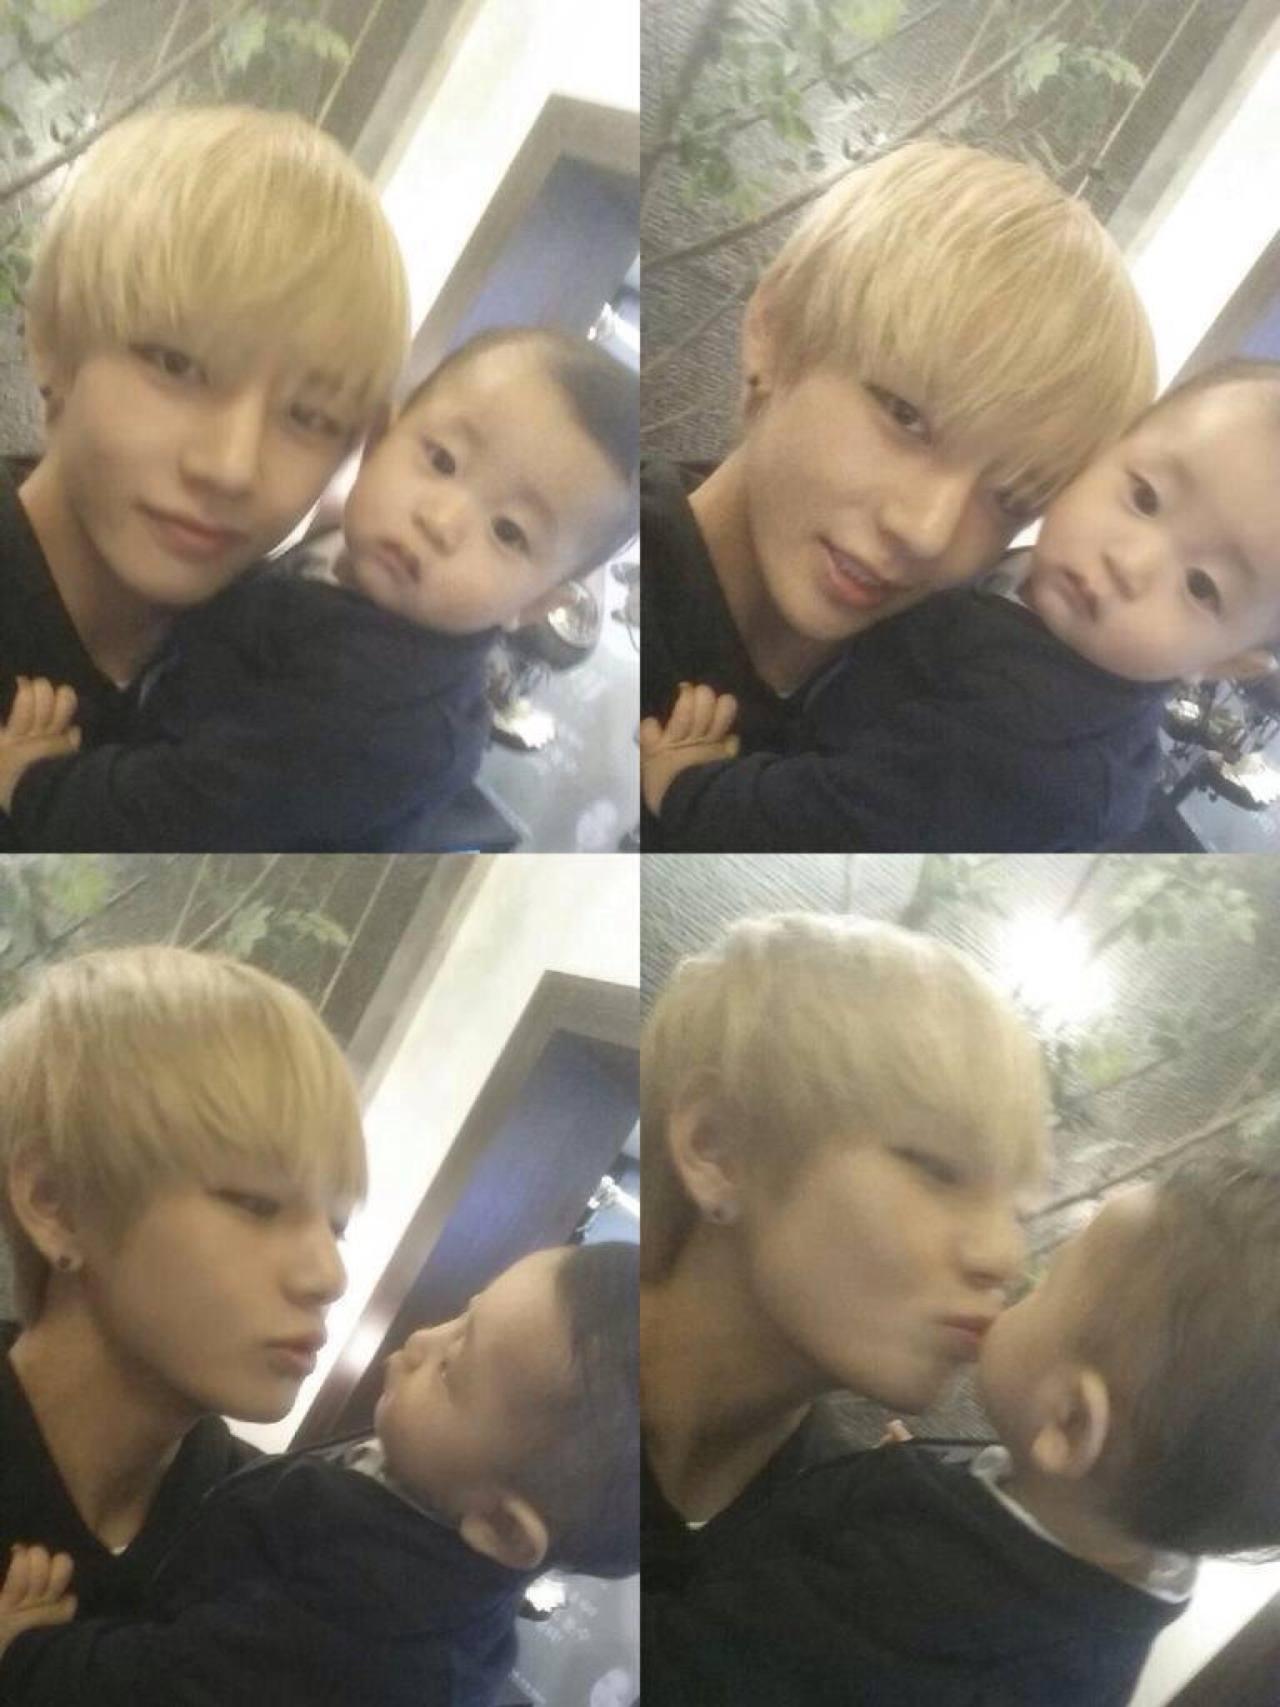 Yeri and jong hyun dating 1